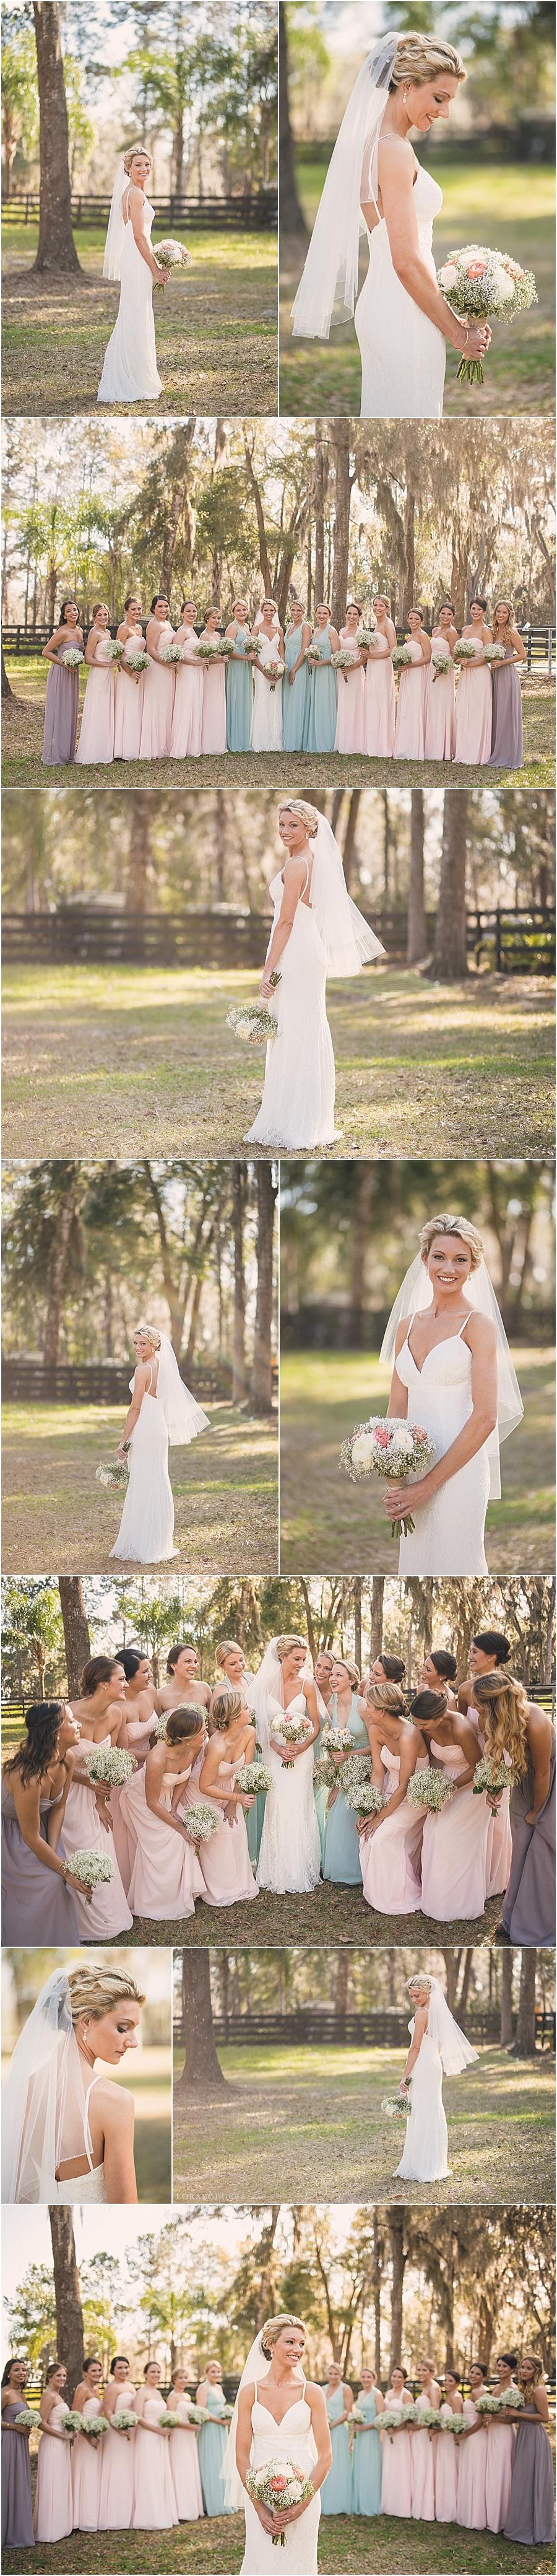 Country_Chic_Ocala_Wedding_005